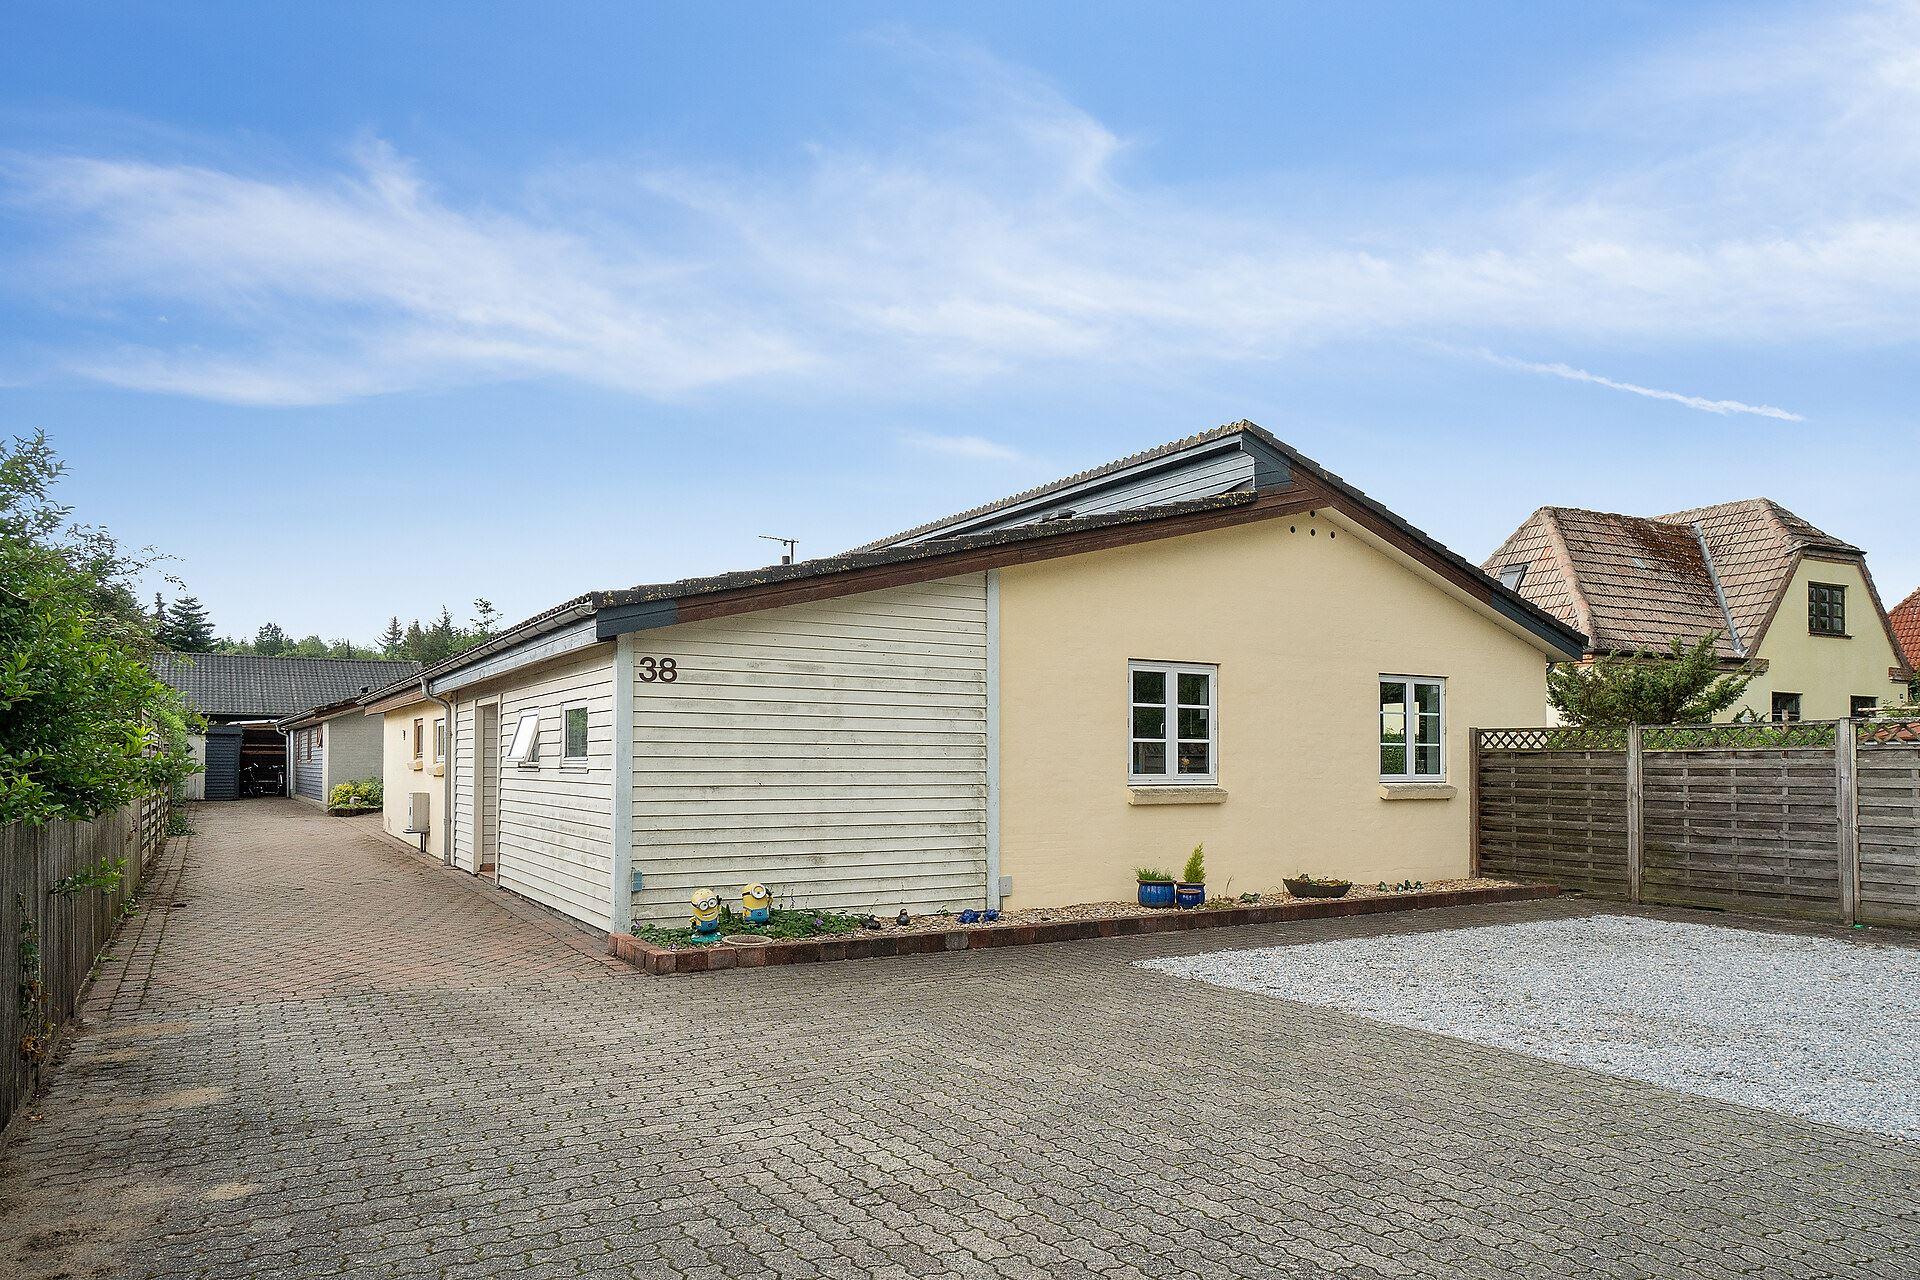 Møllegårdsvej 38, Resenbro, 8600 Silkeborg